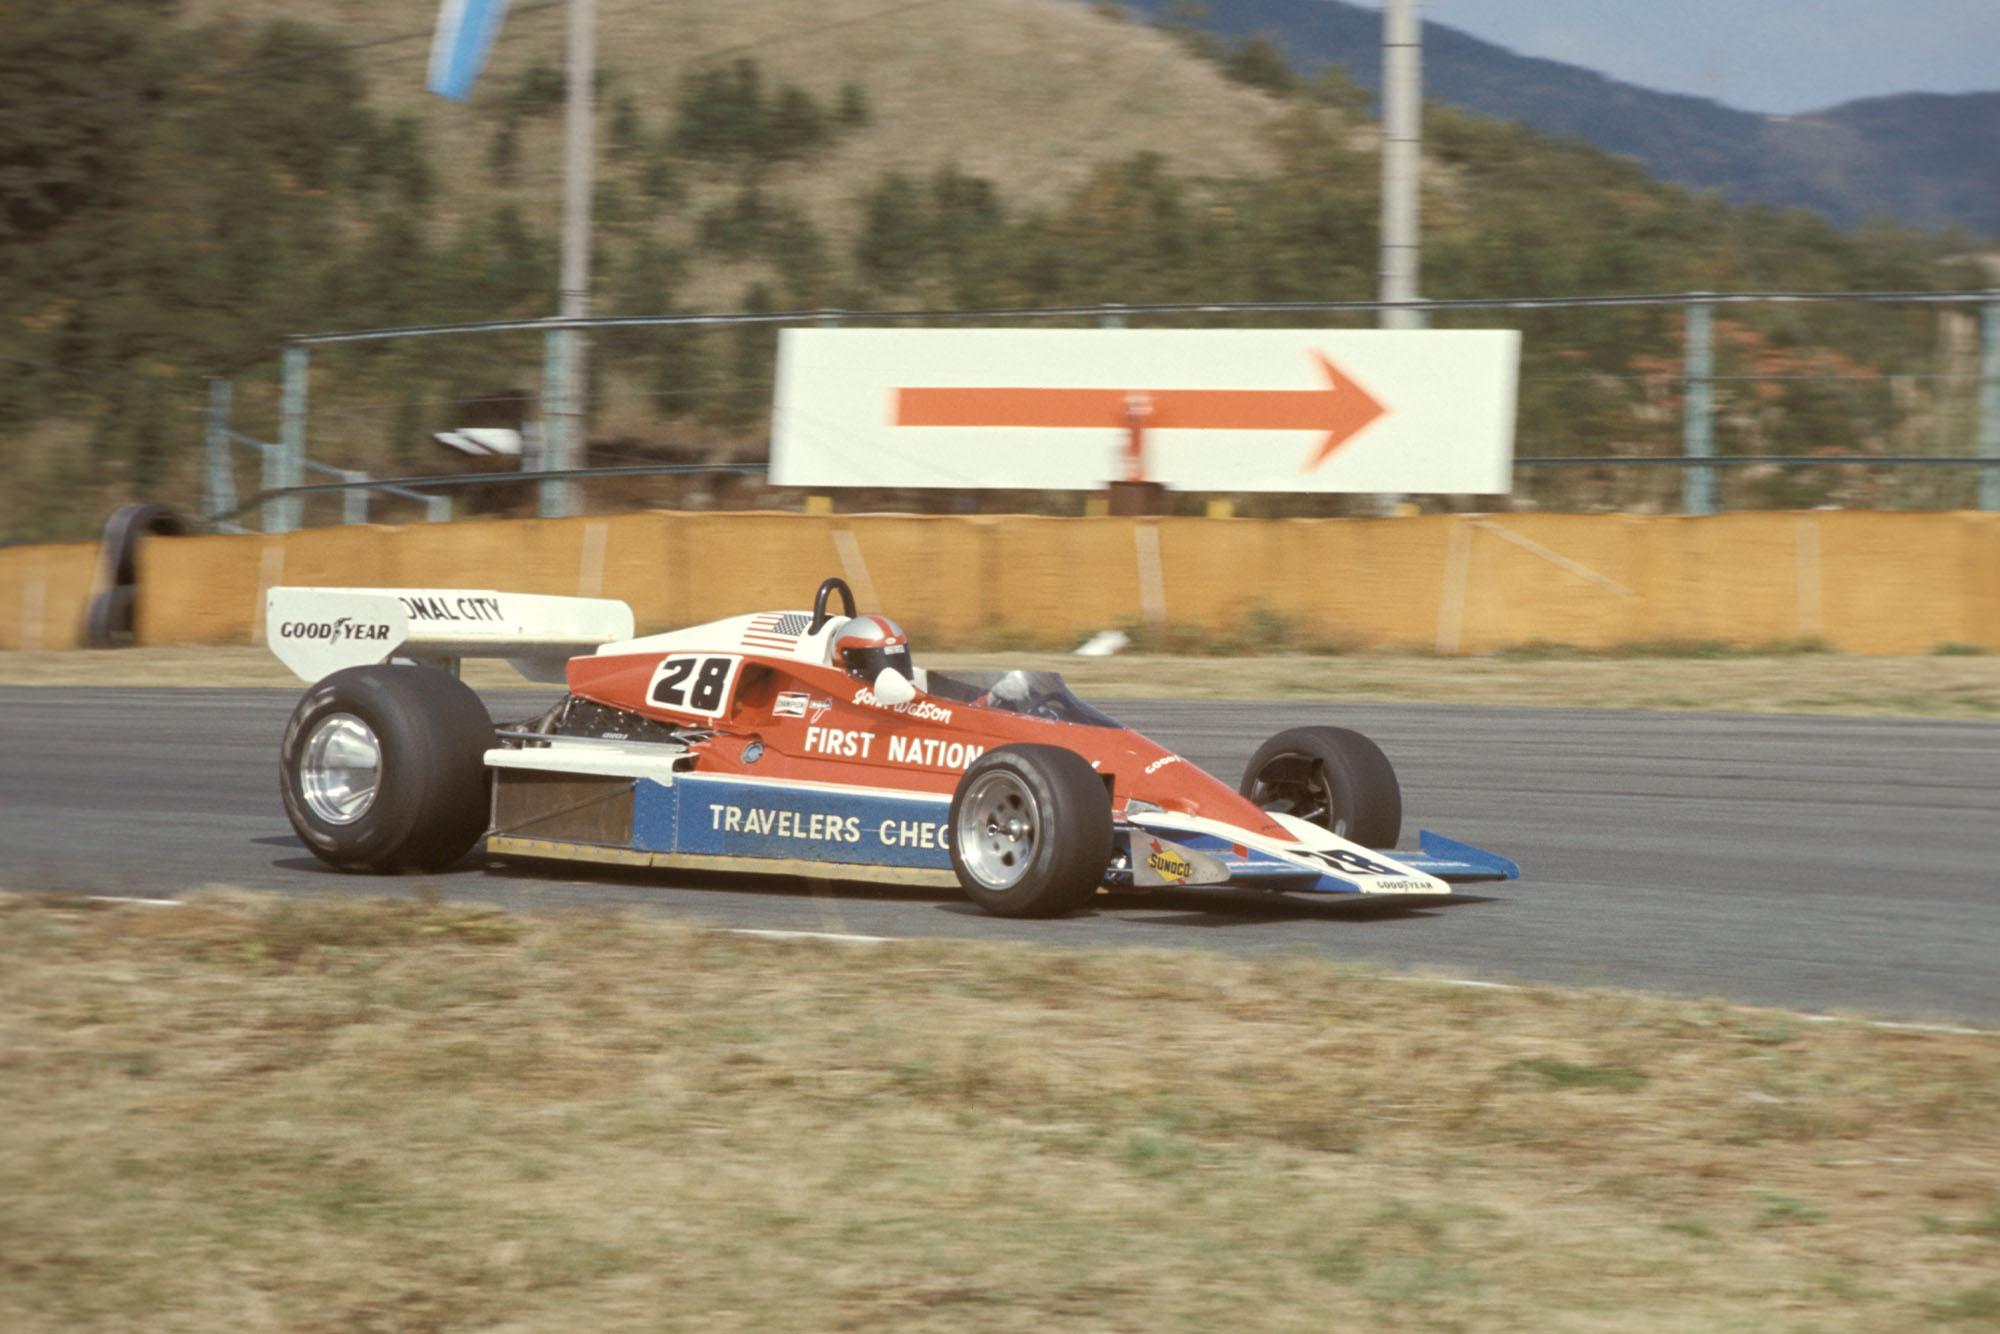 John Watson driving for Penske at the 1976 Japanese Grand Prix, Fuji.